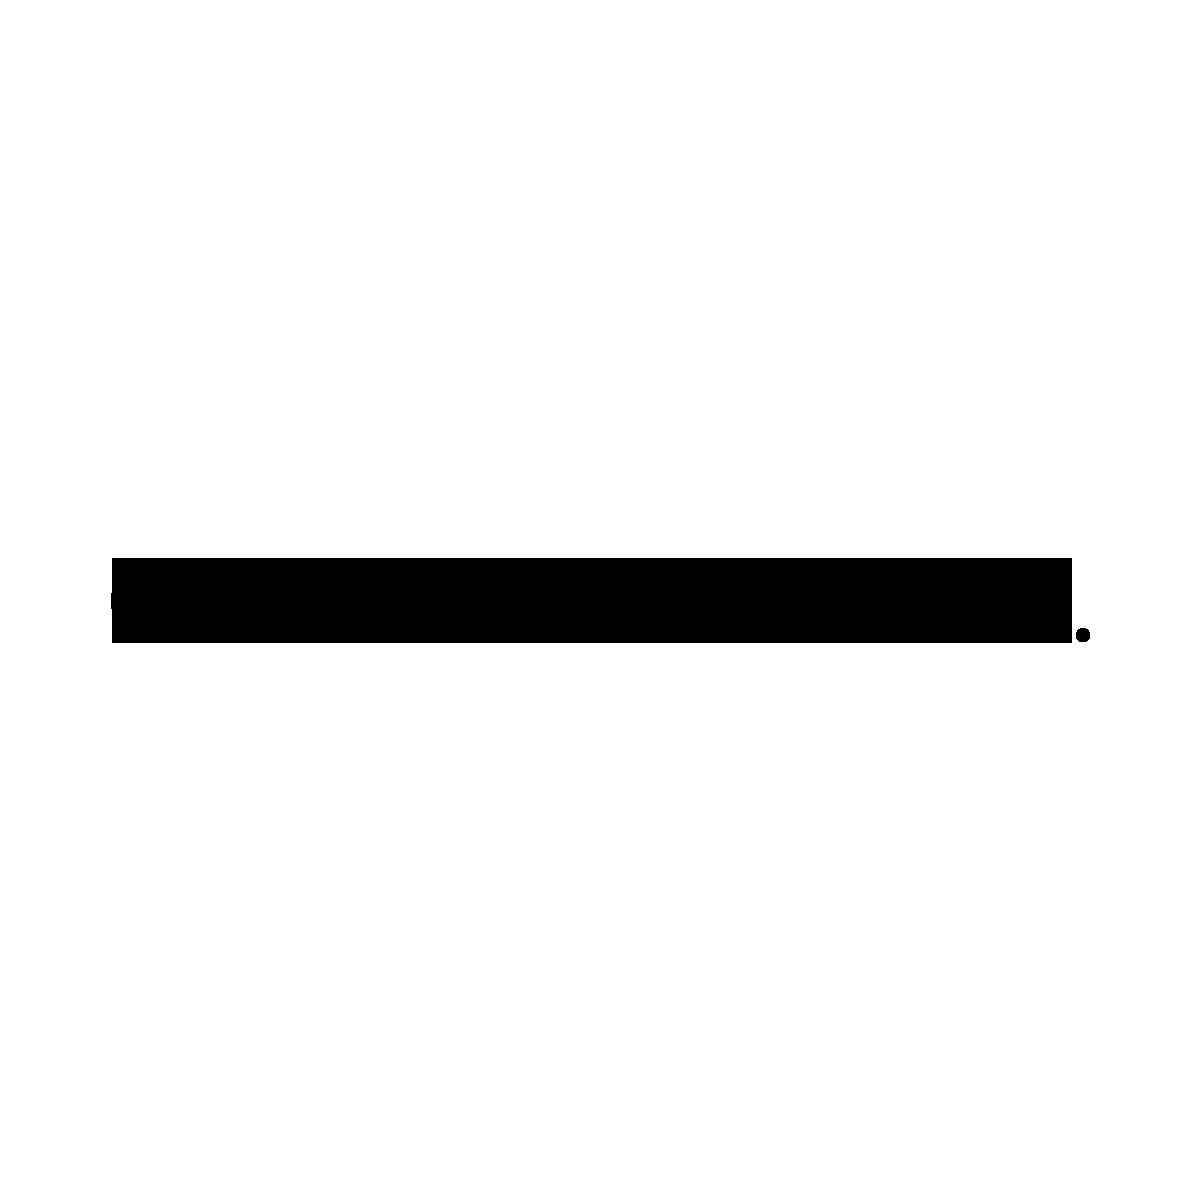 fred de la bretoniere ballerina printed leather taupe 140010002 detail heel